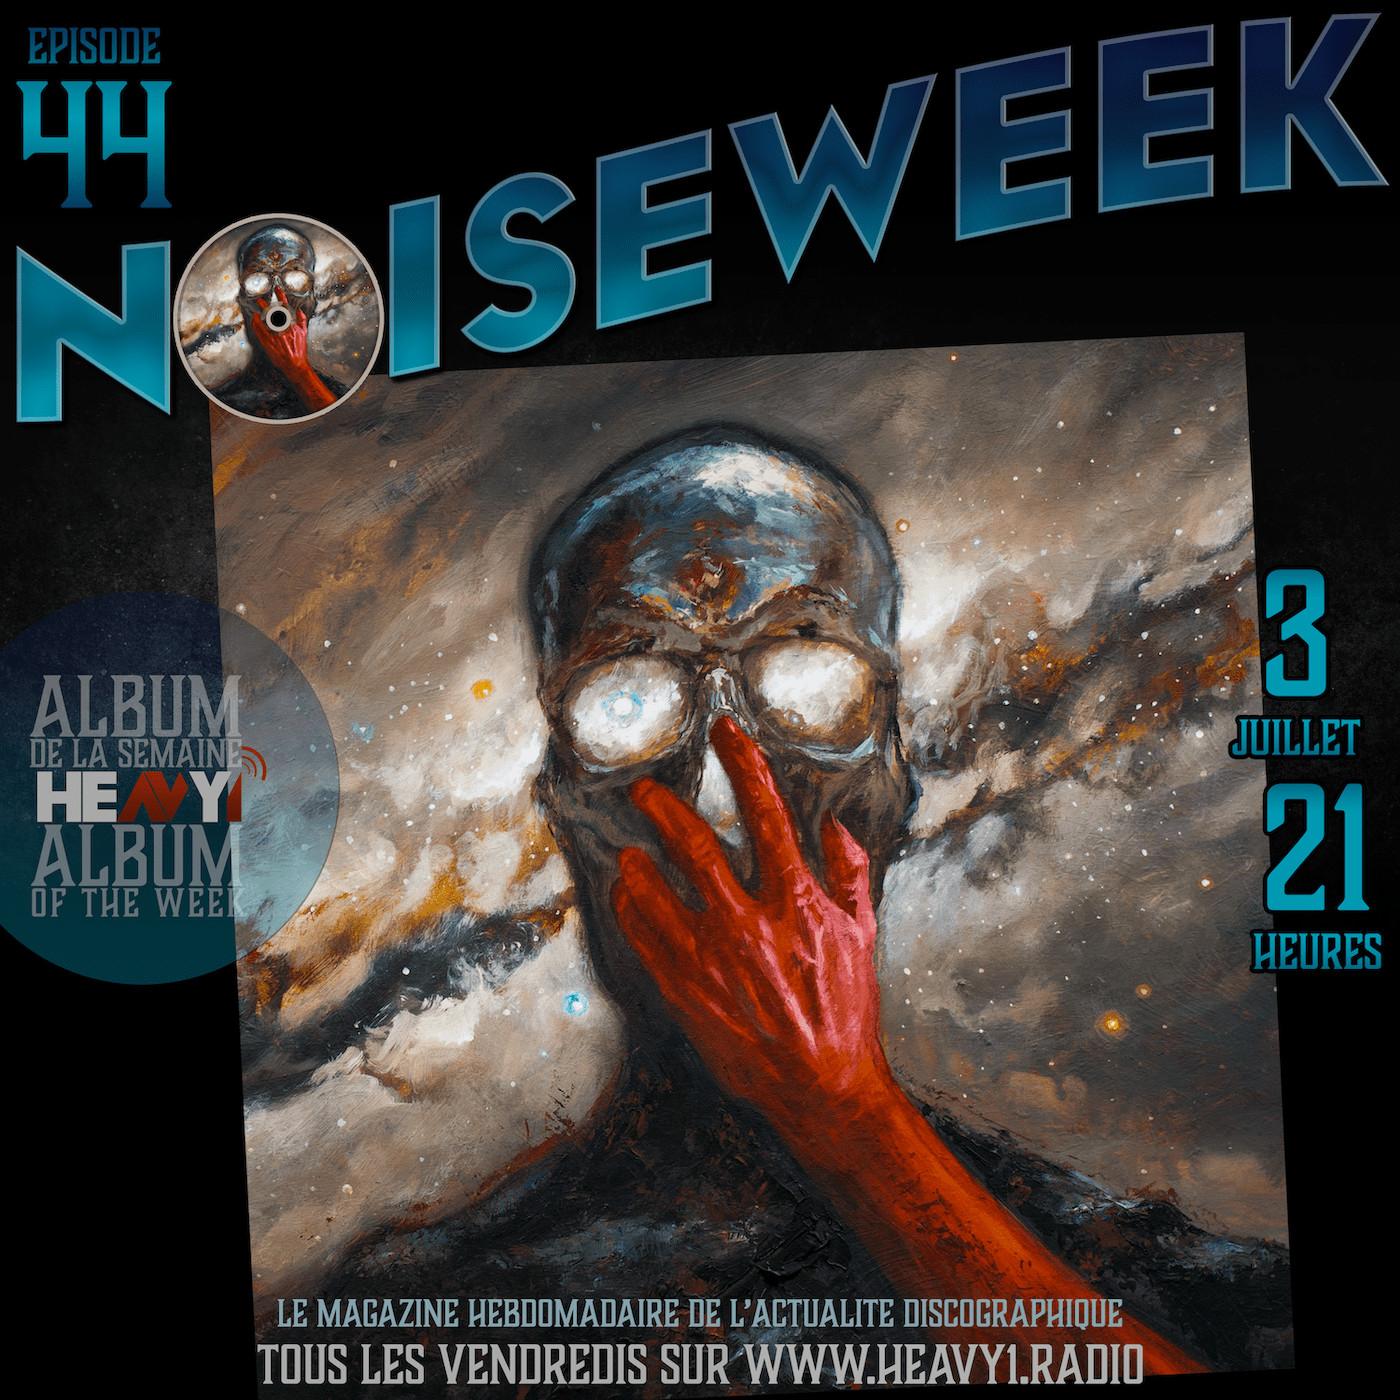 Noiseweek #44 Saison 3